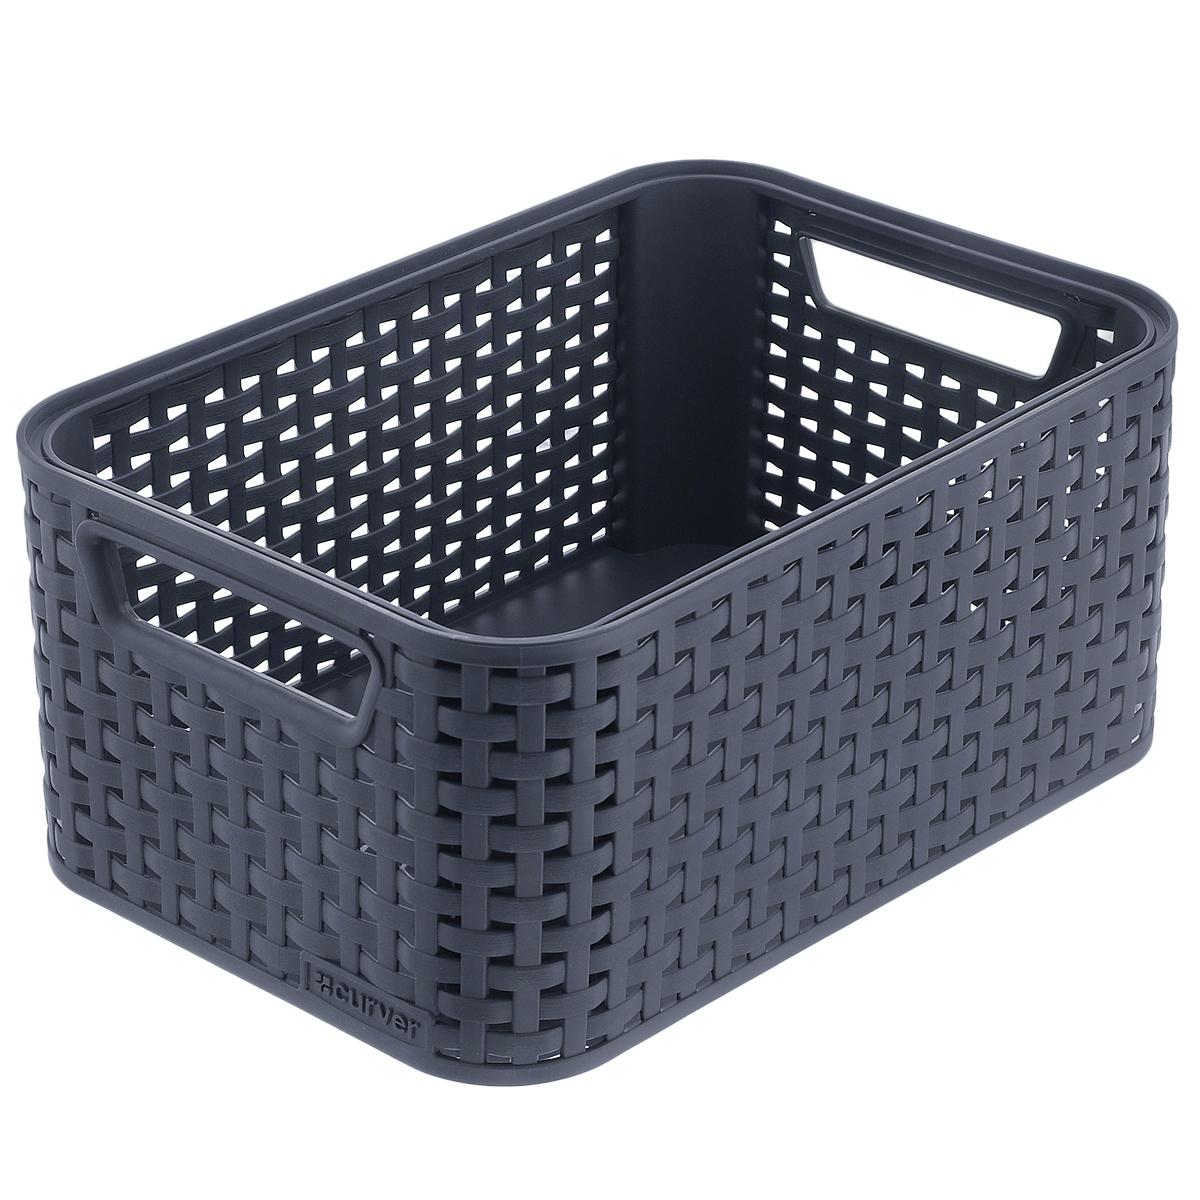 коробка для хранения curver usa flag 39 см х 29 23 см Корзинка универсальная Curver Style, цвет: темно-серый, 44 см х 33 см х 23 см